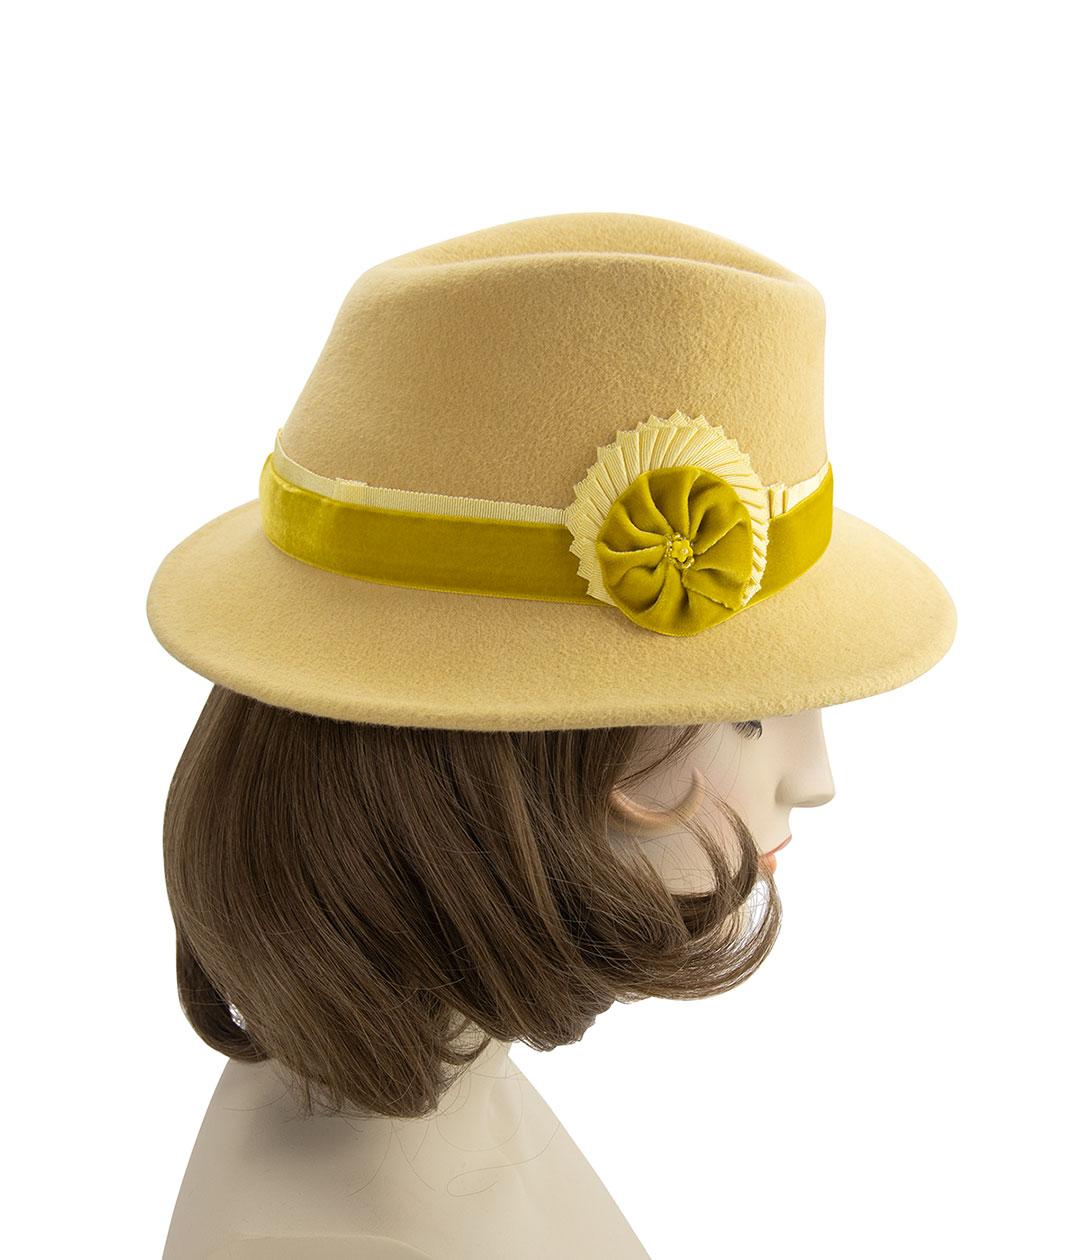 Yellow 1940s style fedora